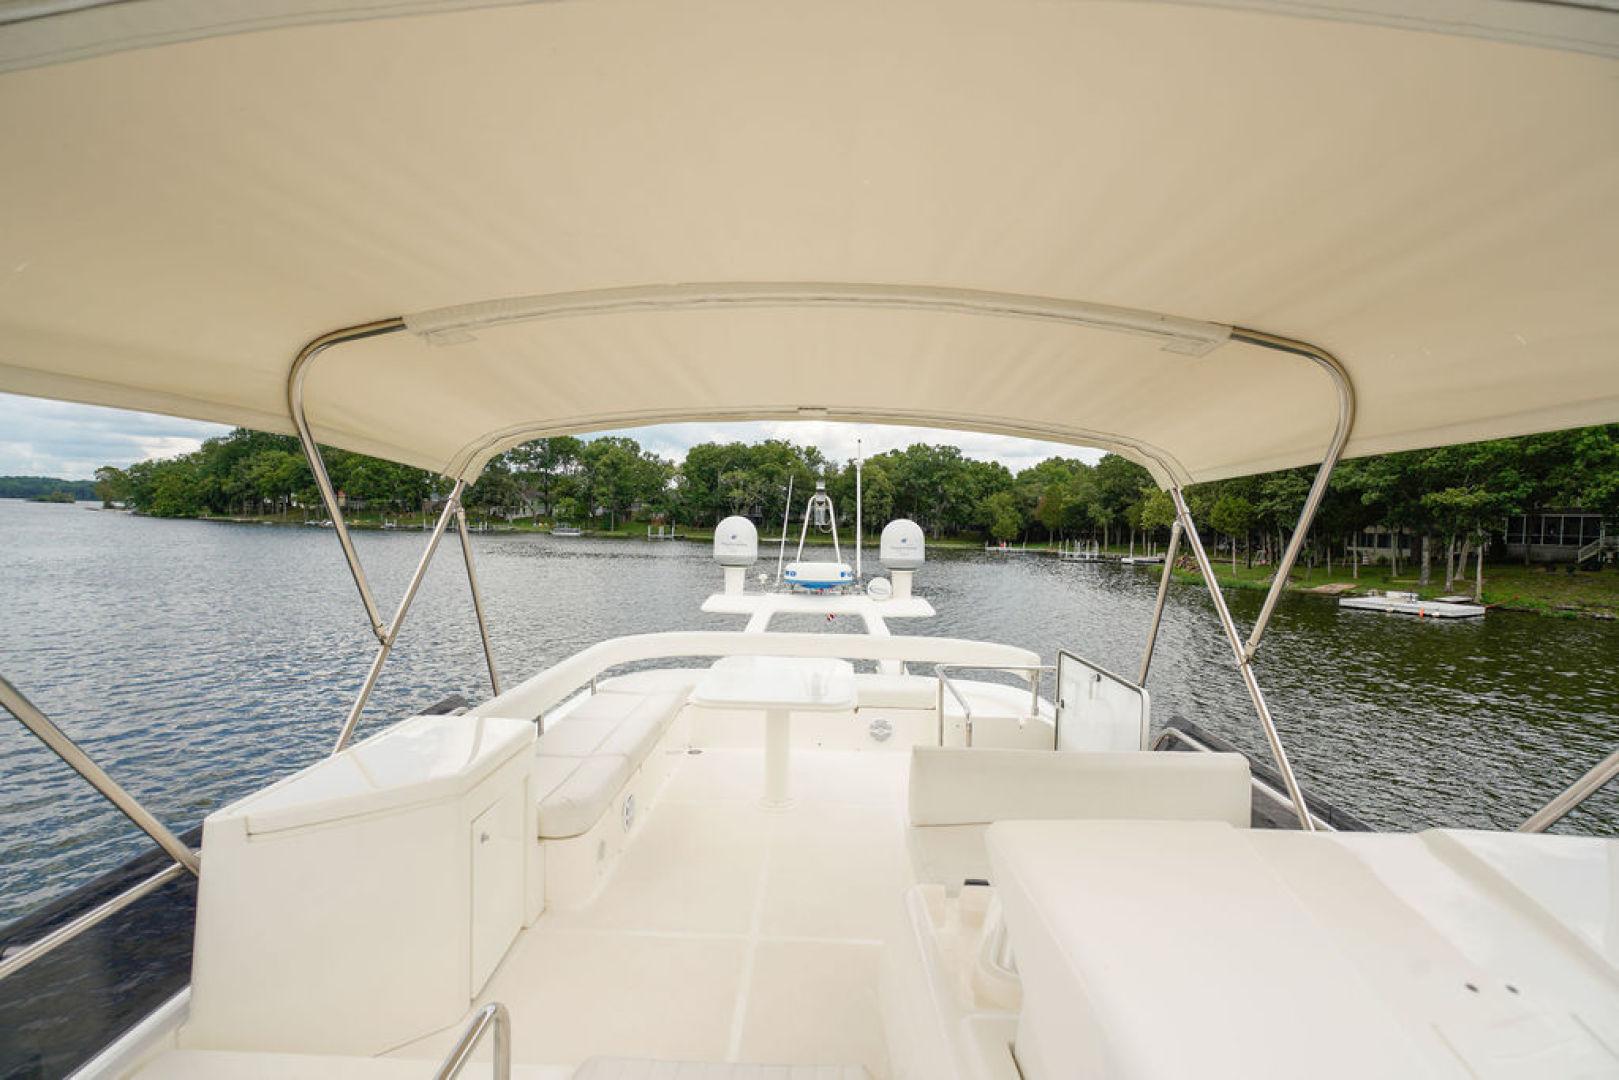 Ferretti Yachts-530 2013-ISLAND GIRL Mount Juliet-Tennessee-United States-1574682   Thumbnail